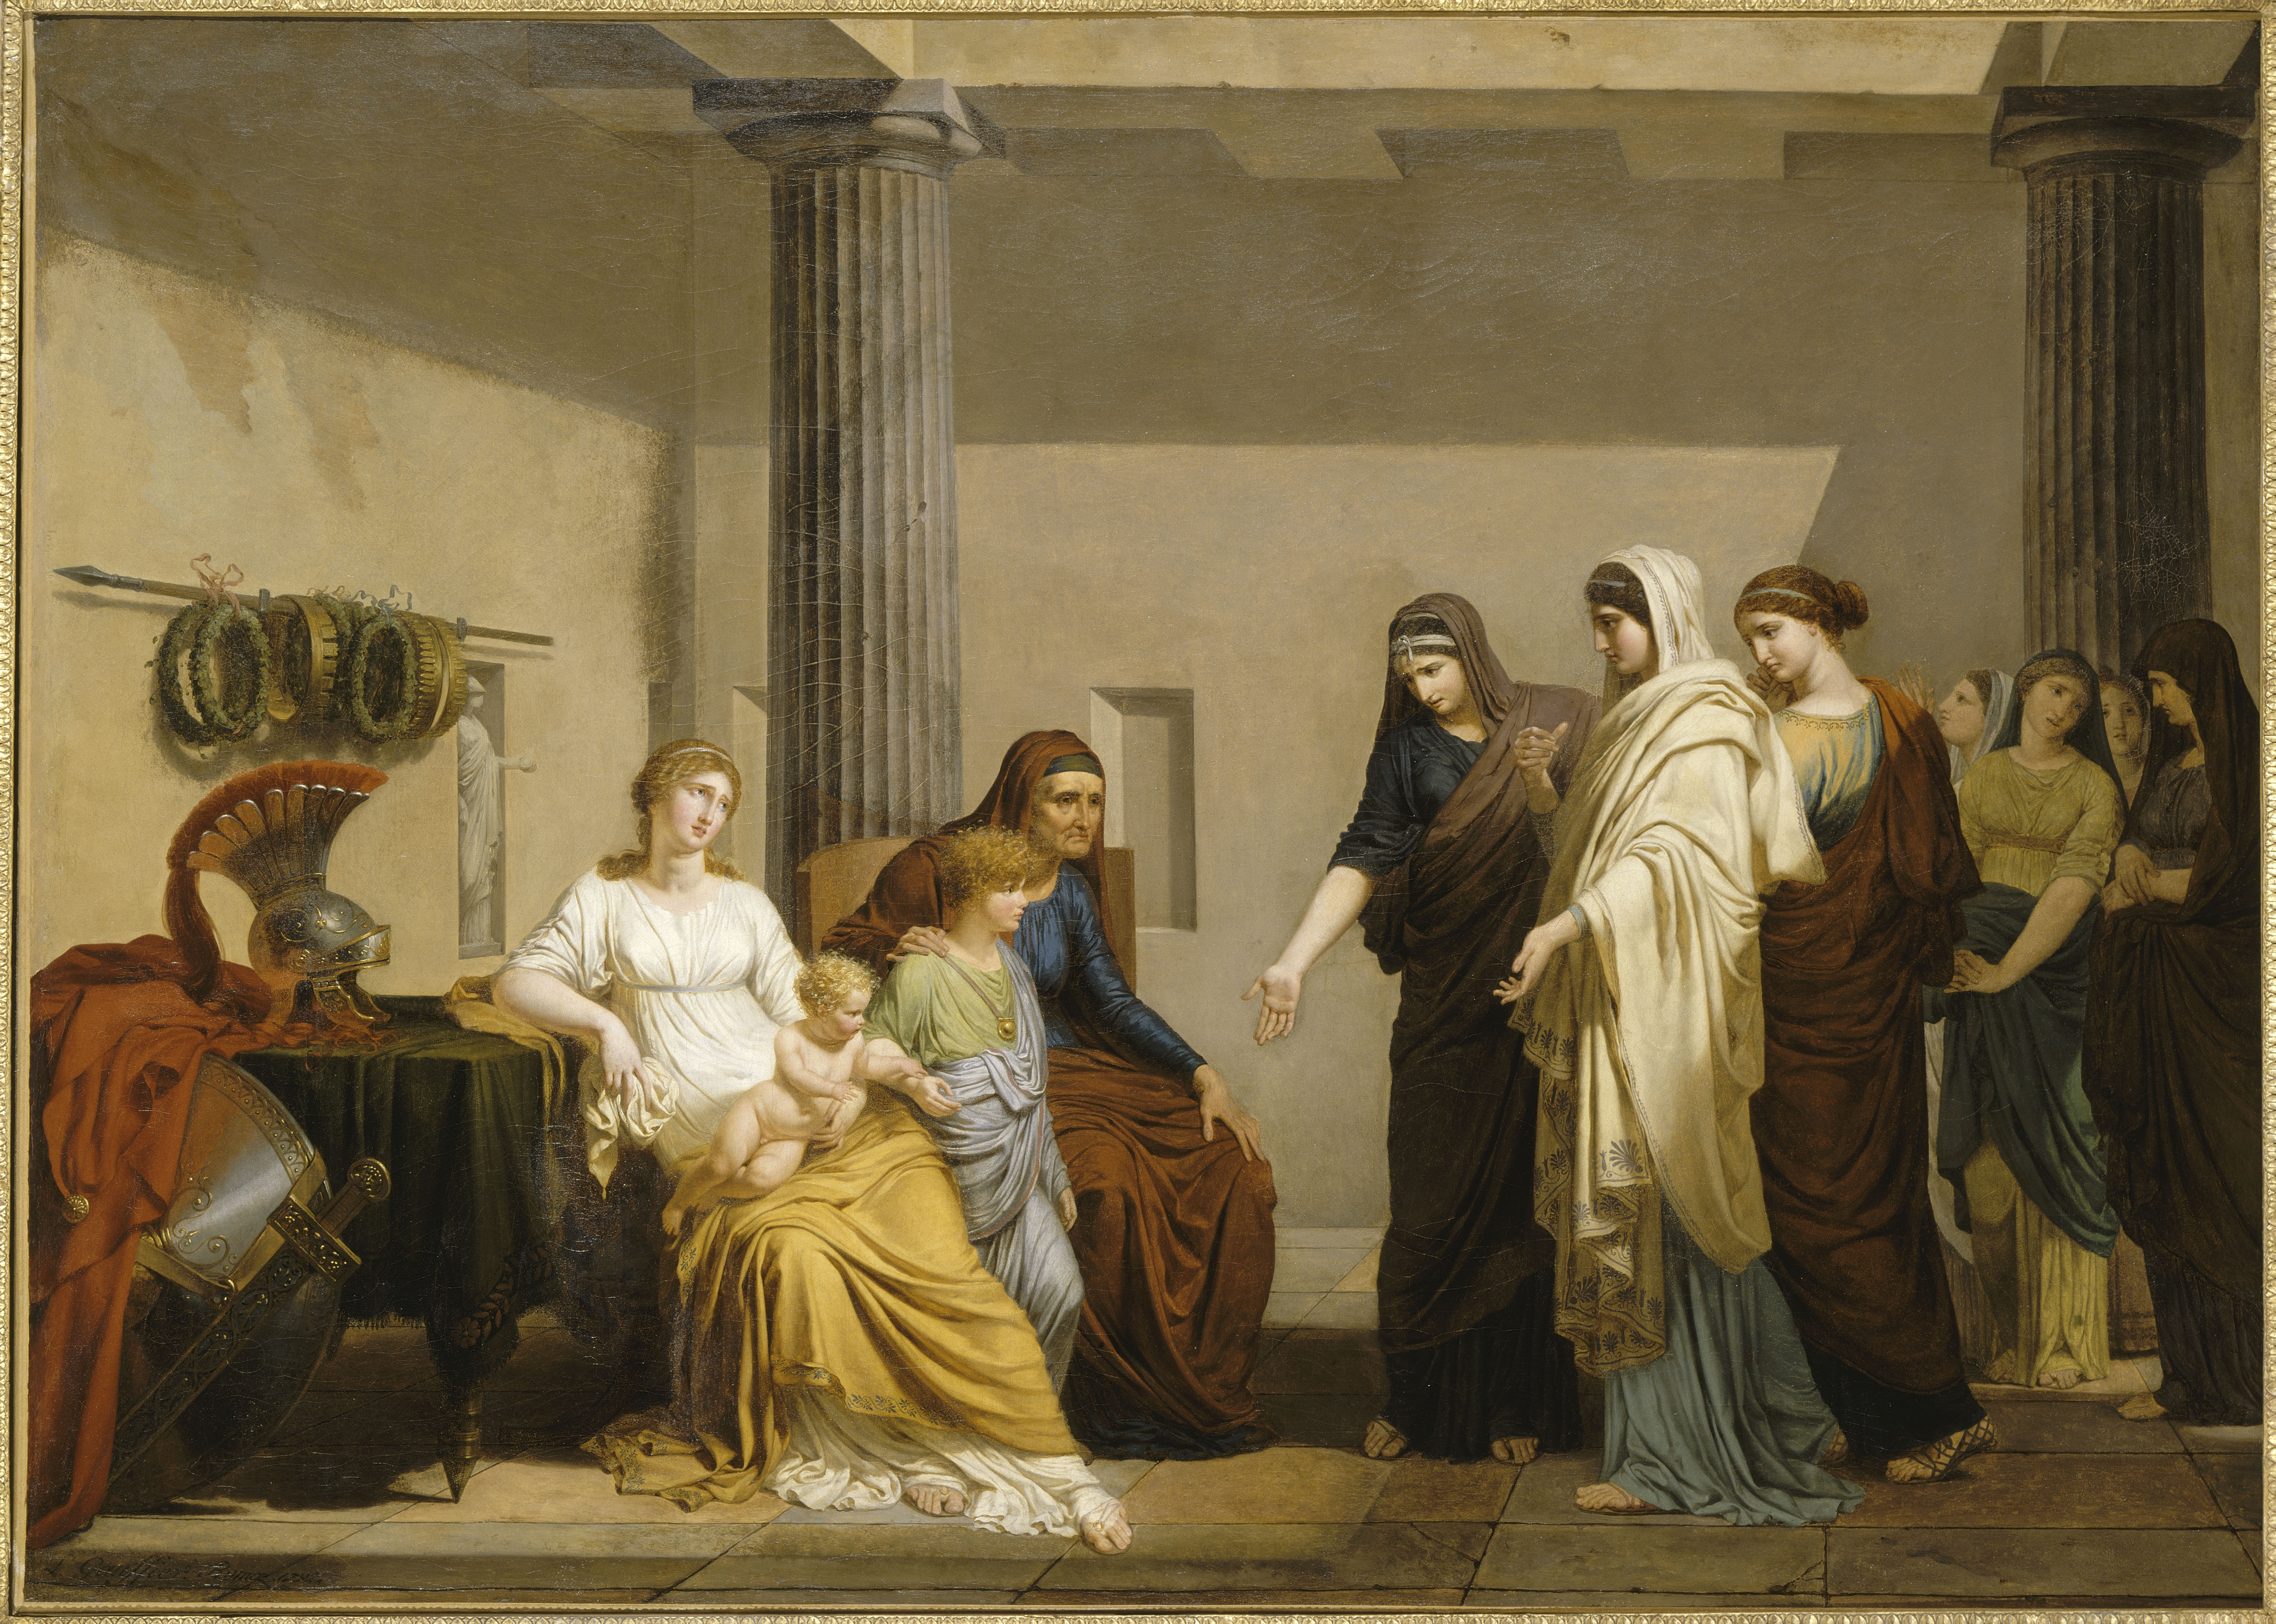 Roman Ladies Plead With the Coriolan Family - Château de Fontainebleau © RMN Grand Palais